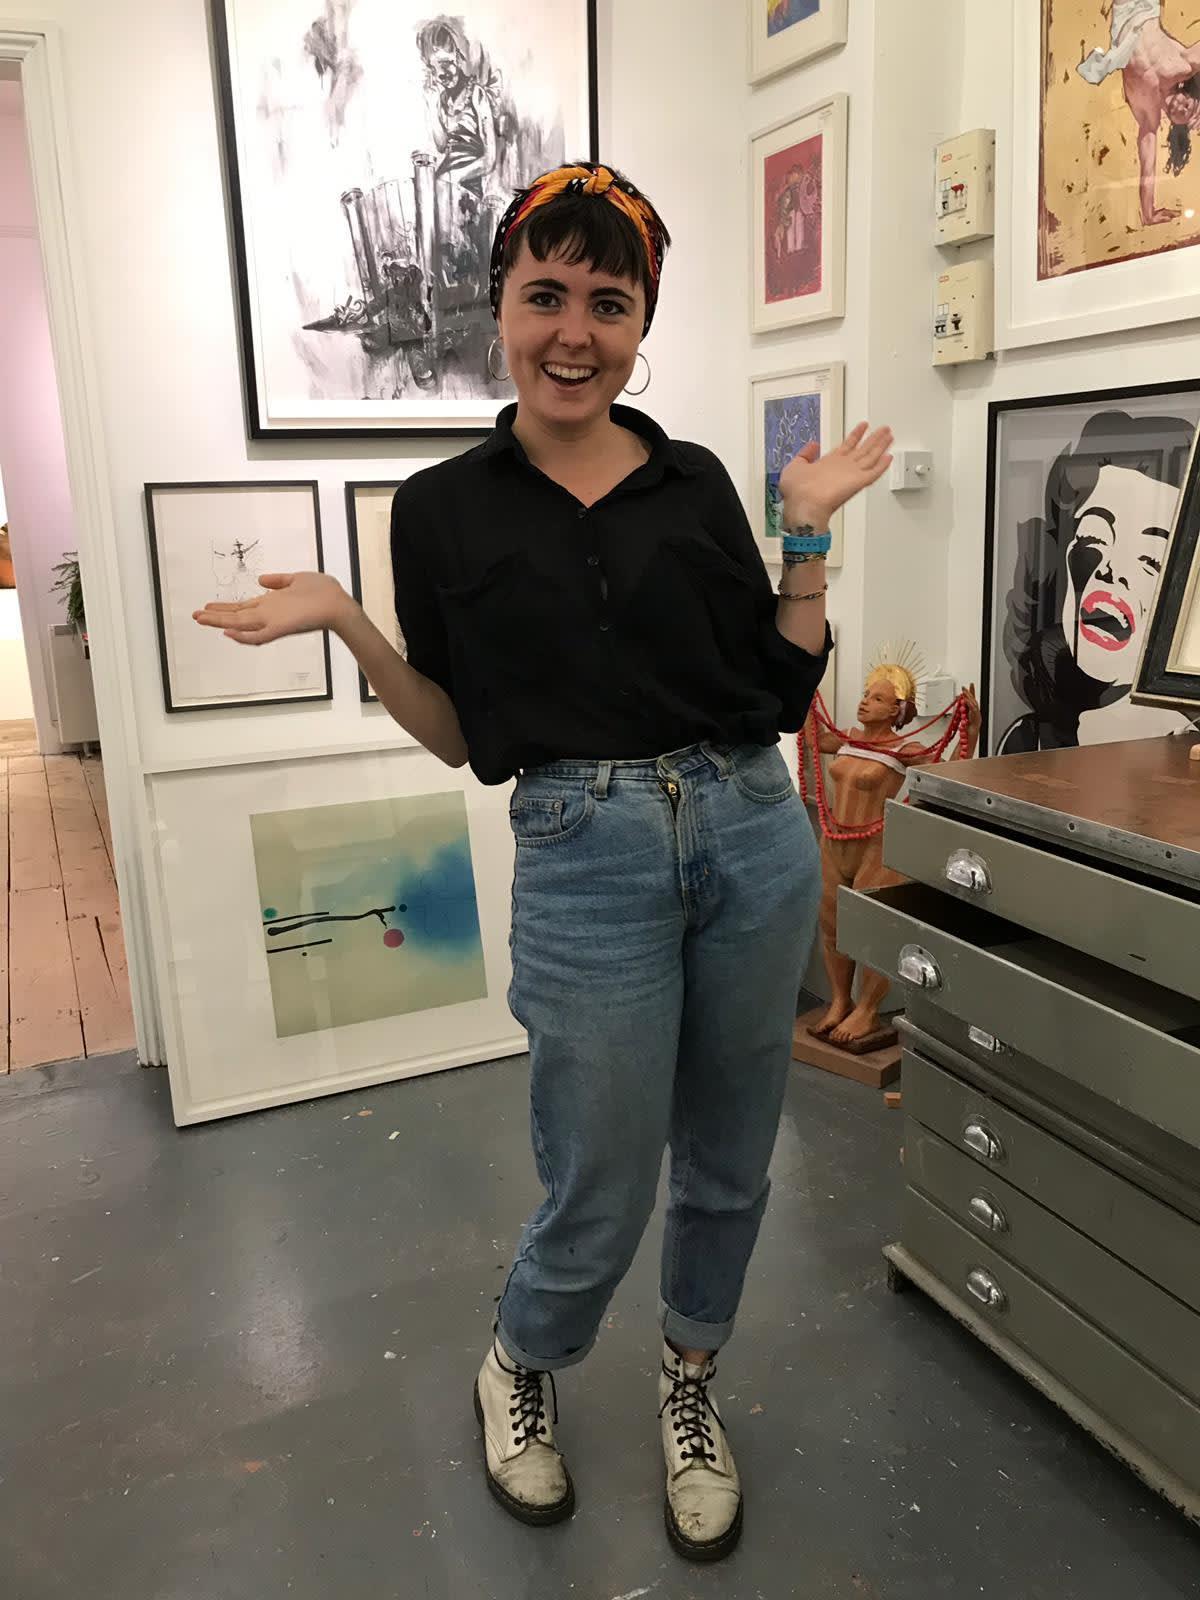 Poppy Boys-Stones, Gallery Manager